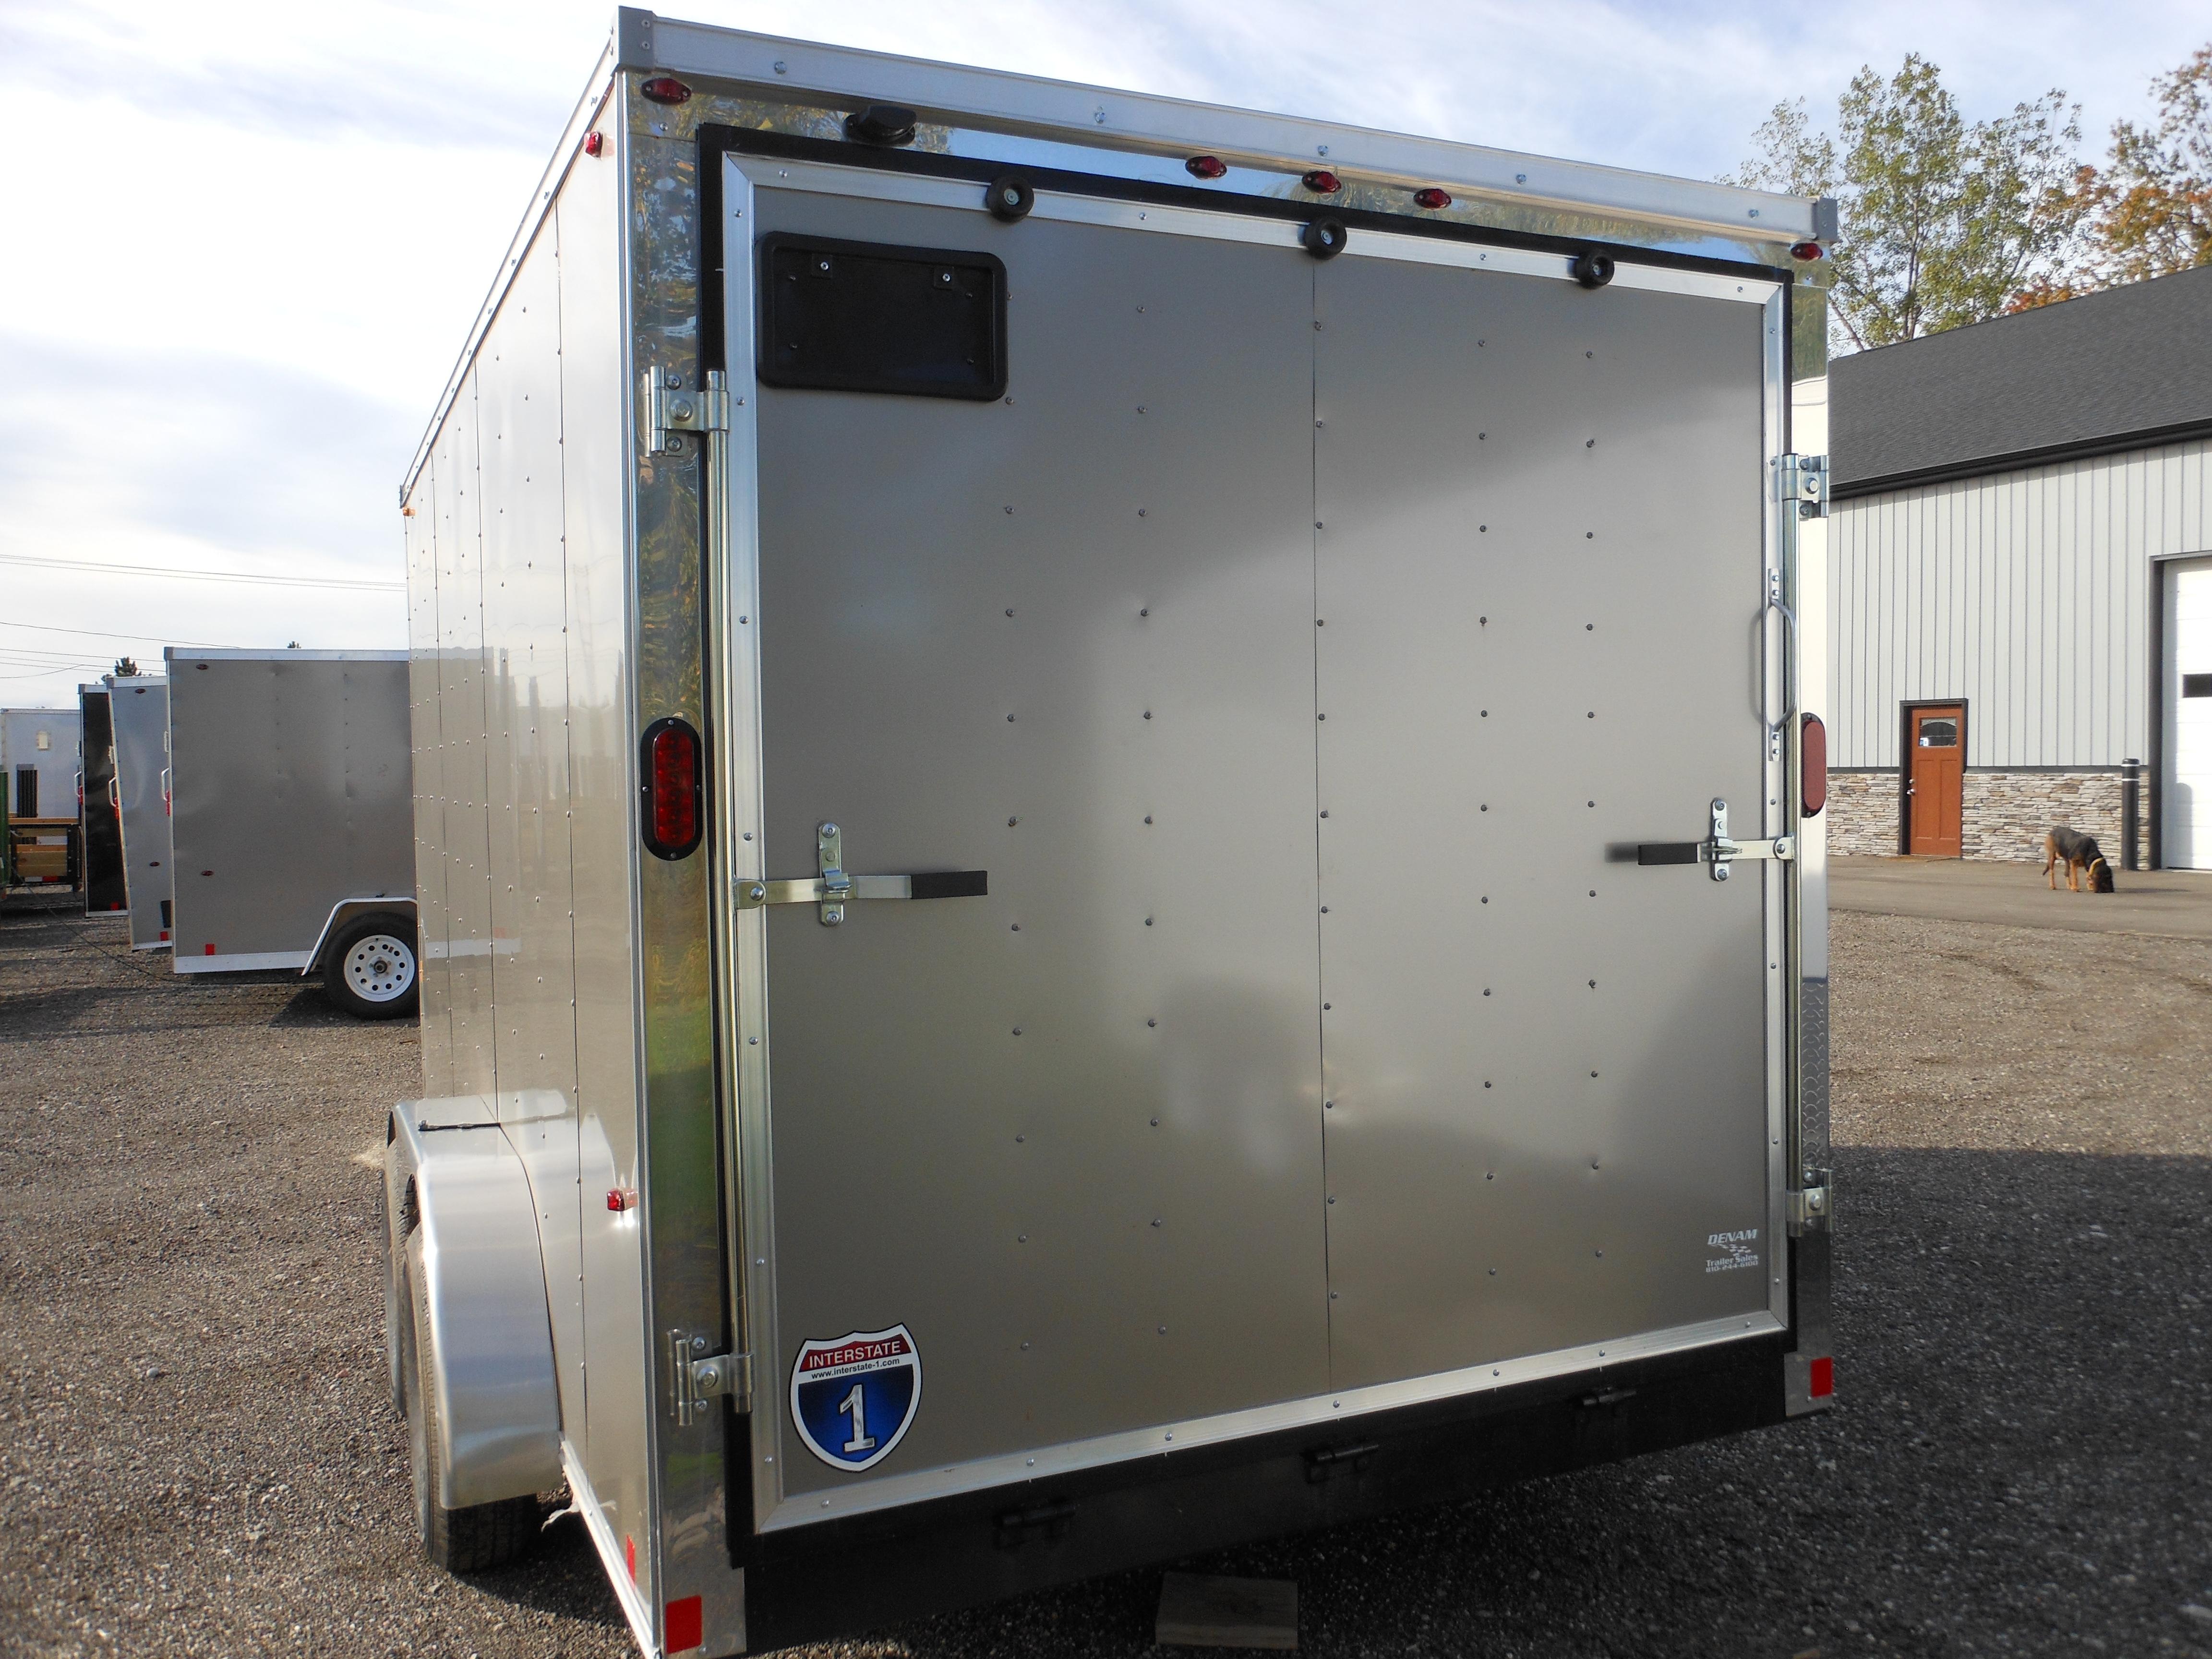 2020 7 X 14 Interstate-1 Enclosed Cargo Trailer, Base Model full